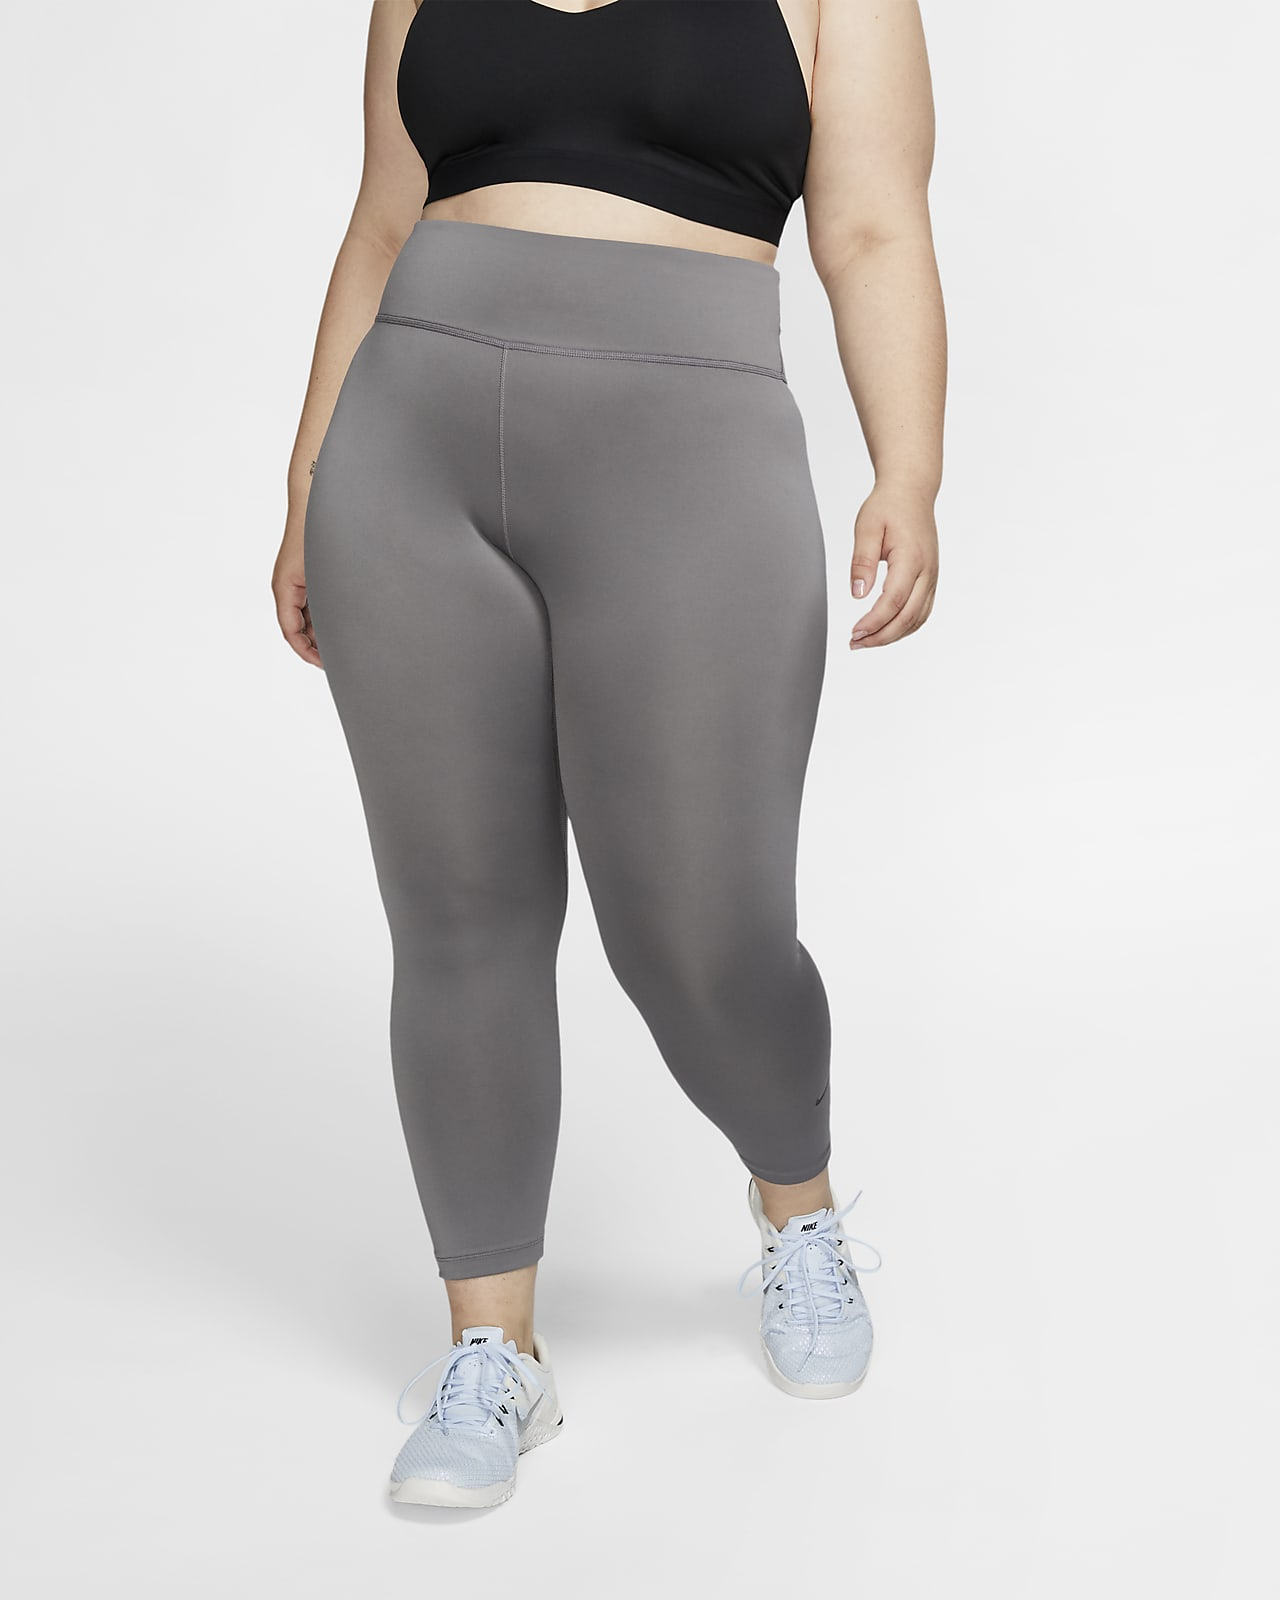 En cantidad campo Violín  Nike One Women's Crops (Plus Size). Nike.com